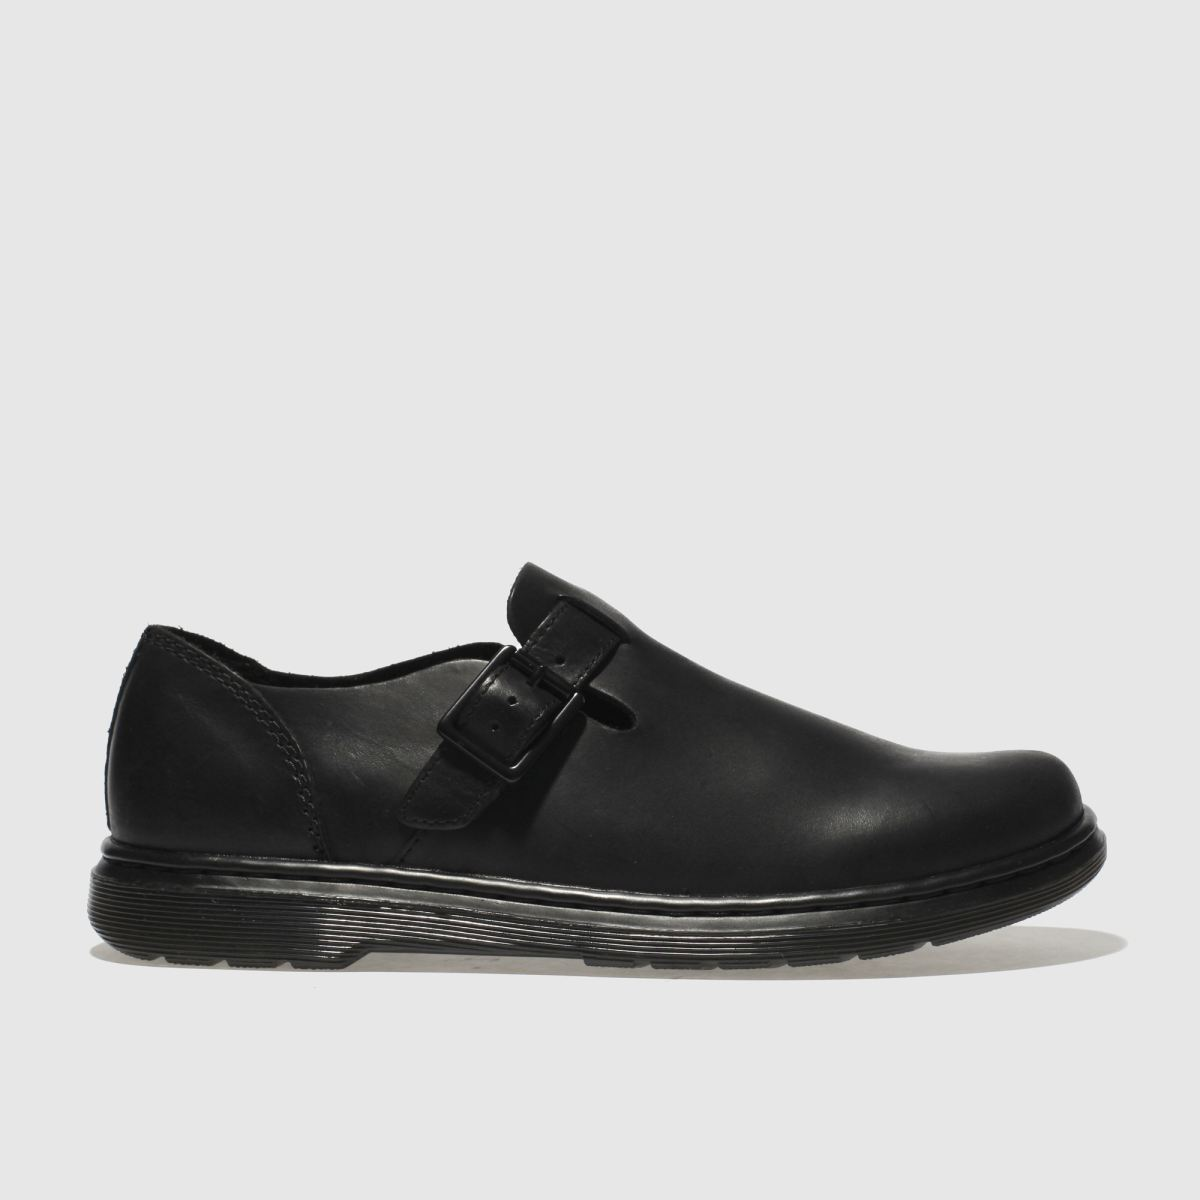 Dr Martens Black Patricia Iii Flat Shoes